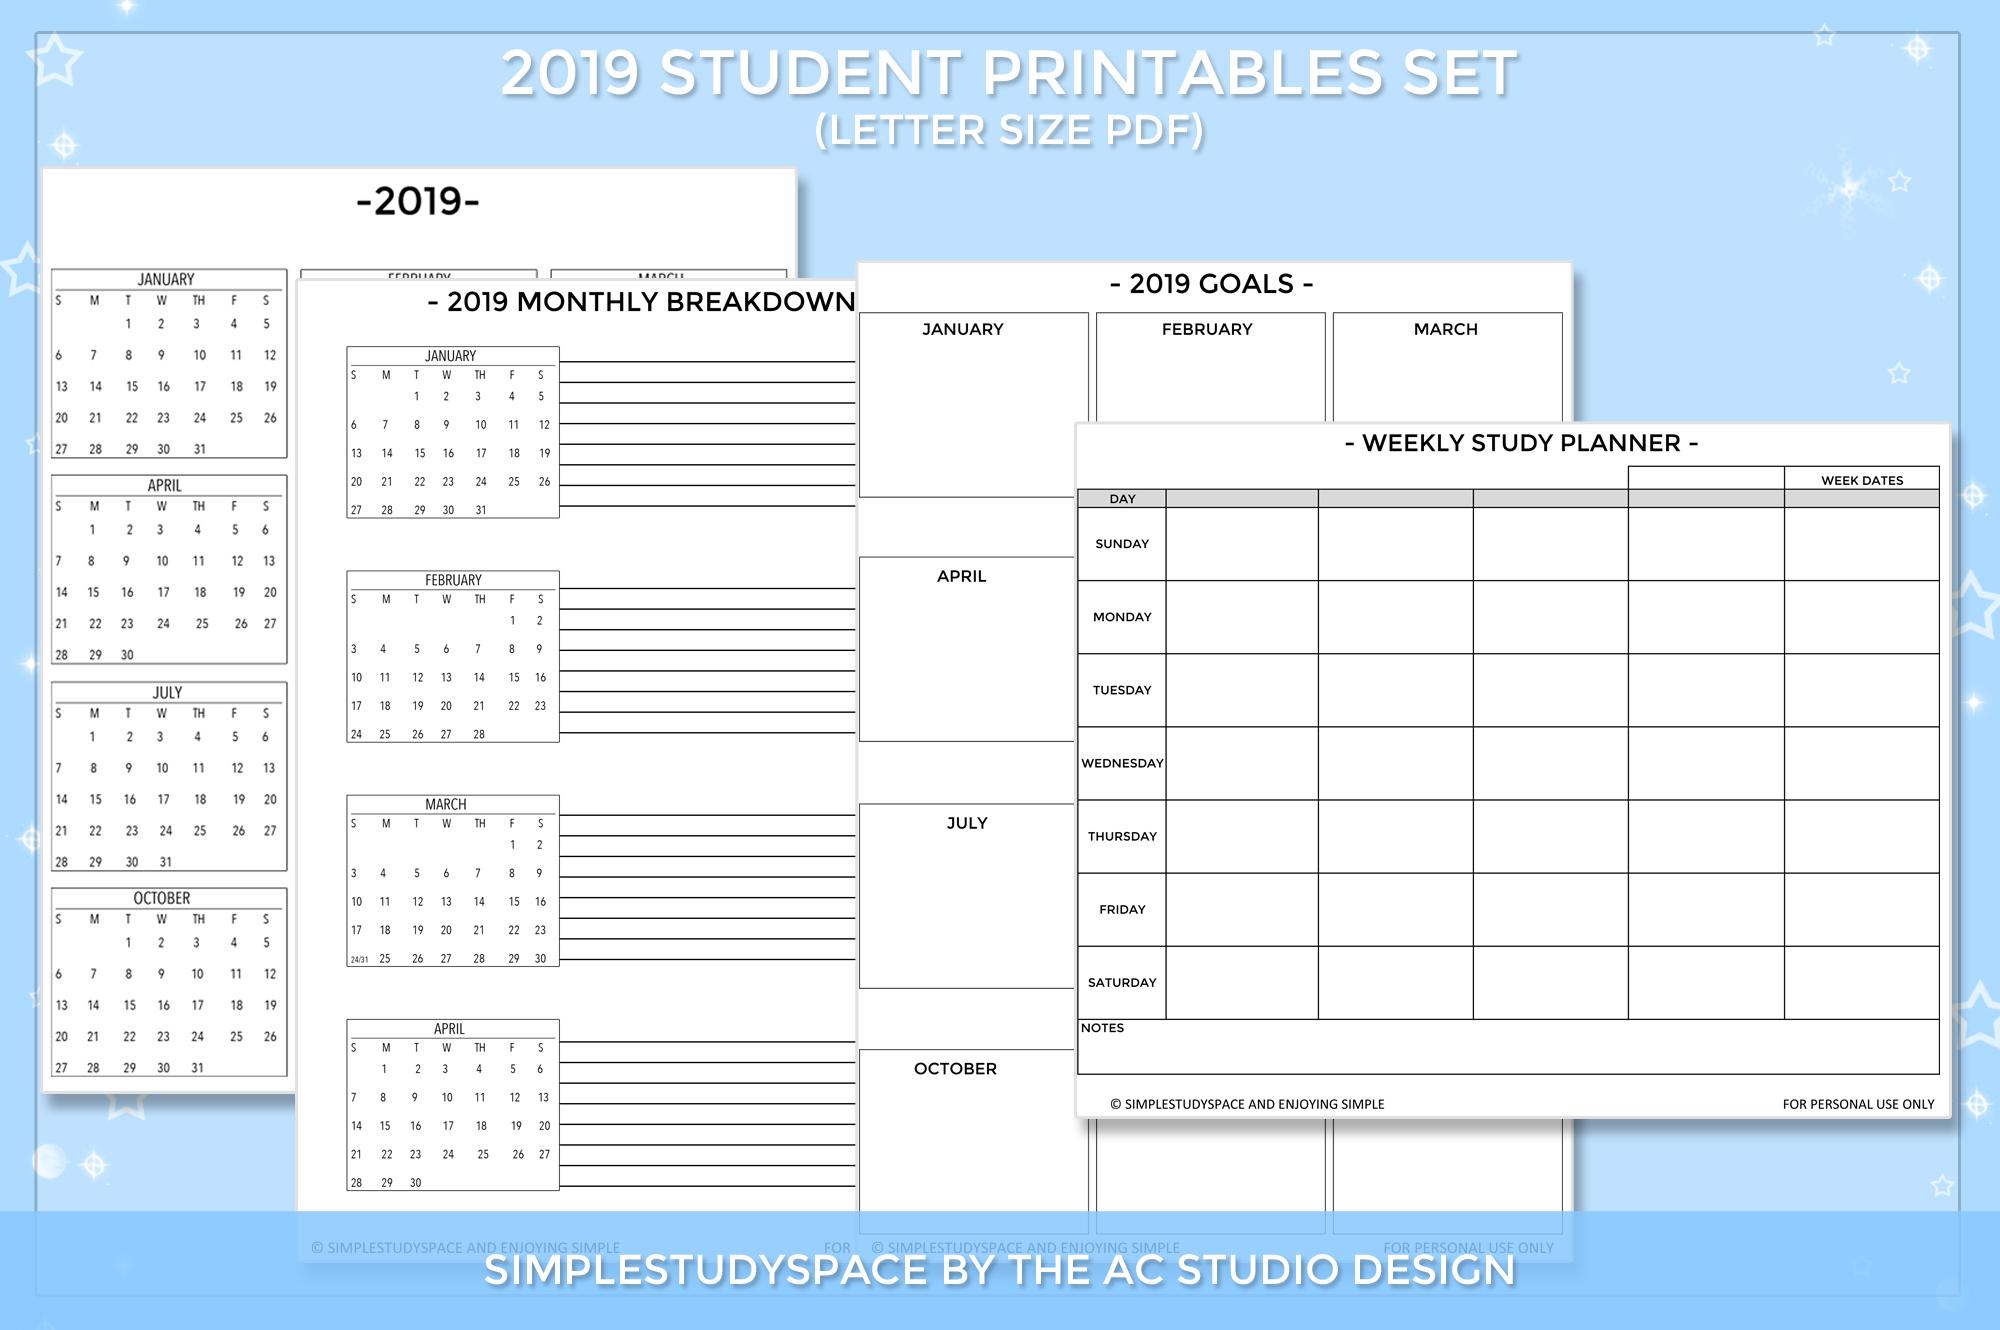 SIMPLESTUDYSPACE - 2019 Student Printables and Digital Planning Set